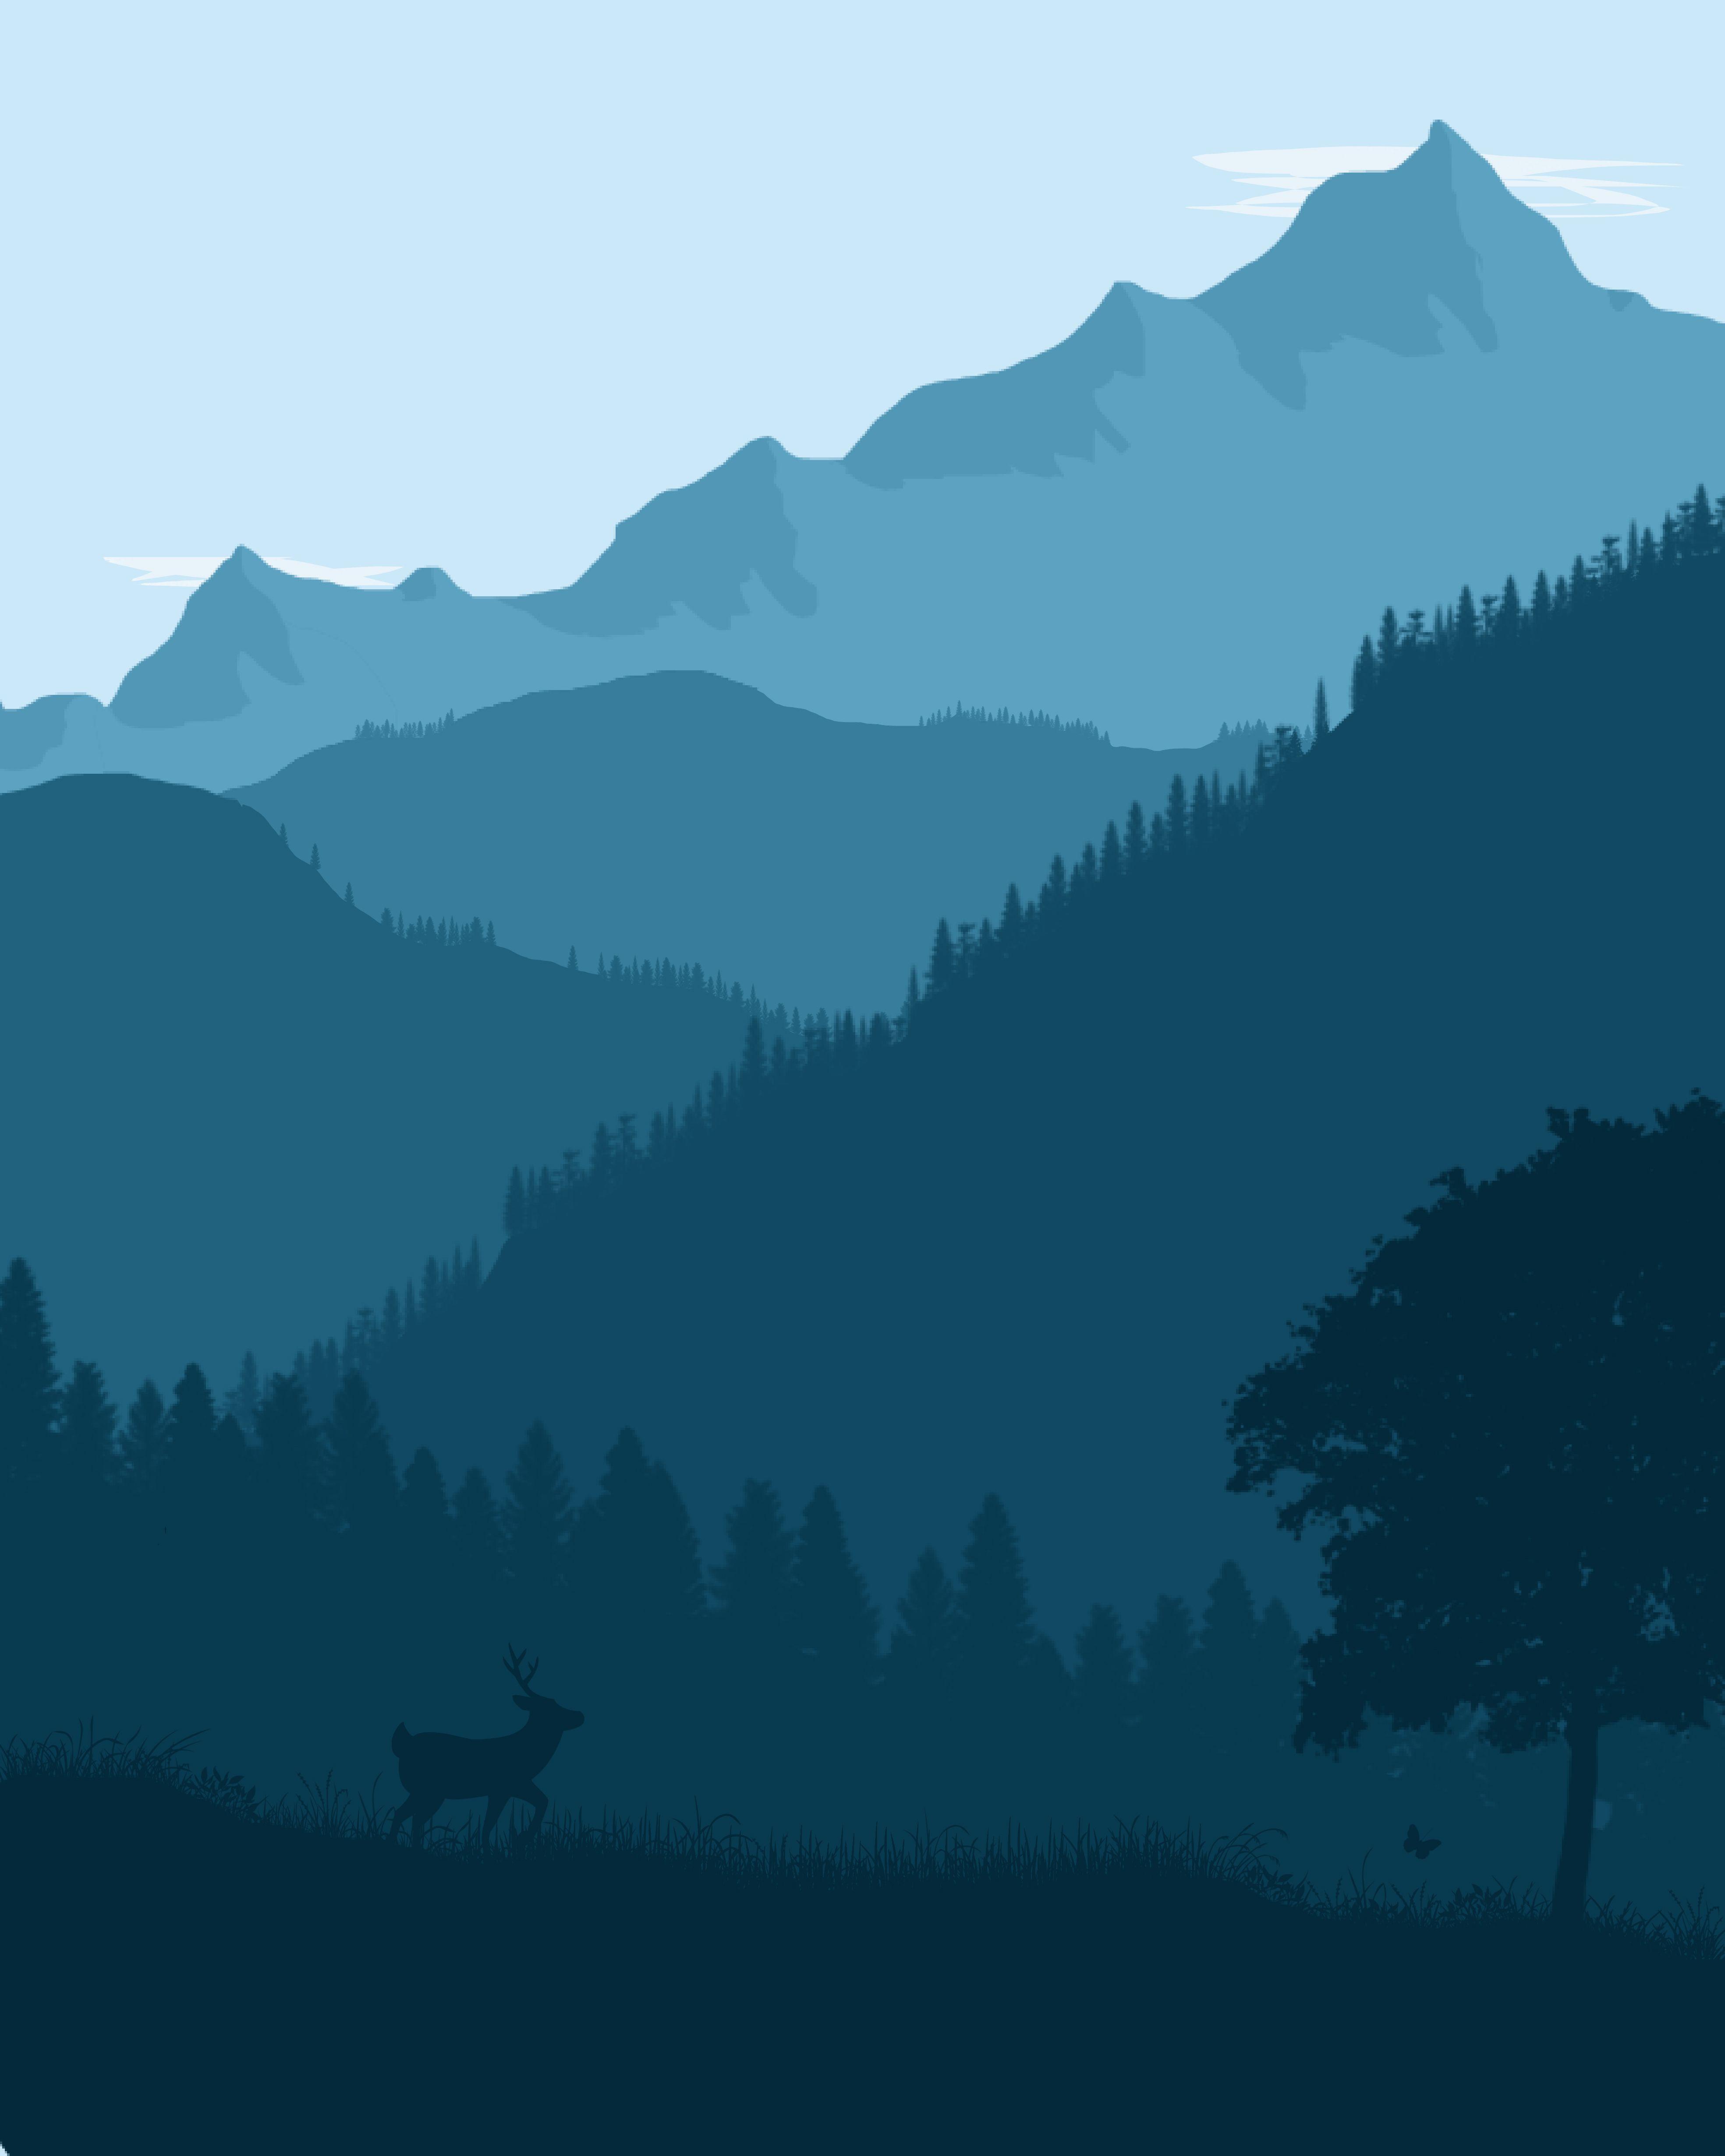 paysage de montagne flat landscape paysage pinterest paysage de montagne et paysages. Black Bedroom Furniture Sets. Home Design Ideas